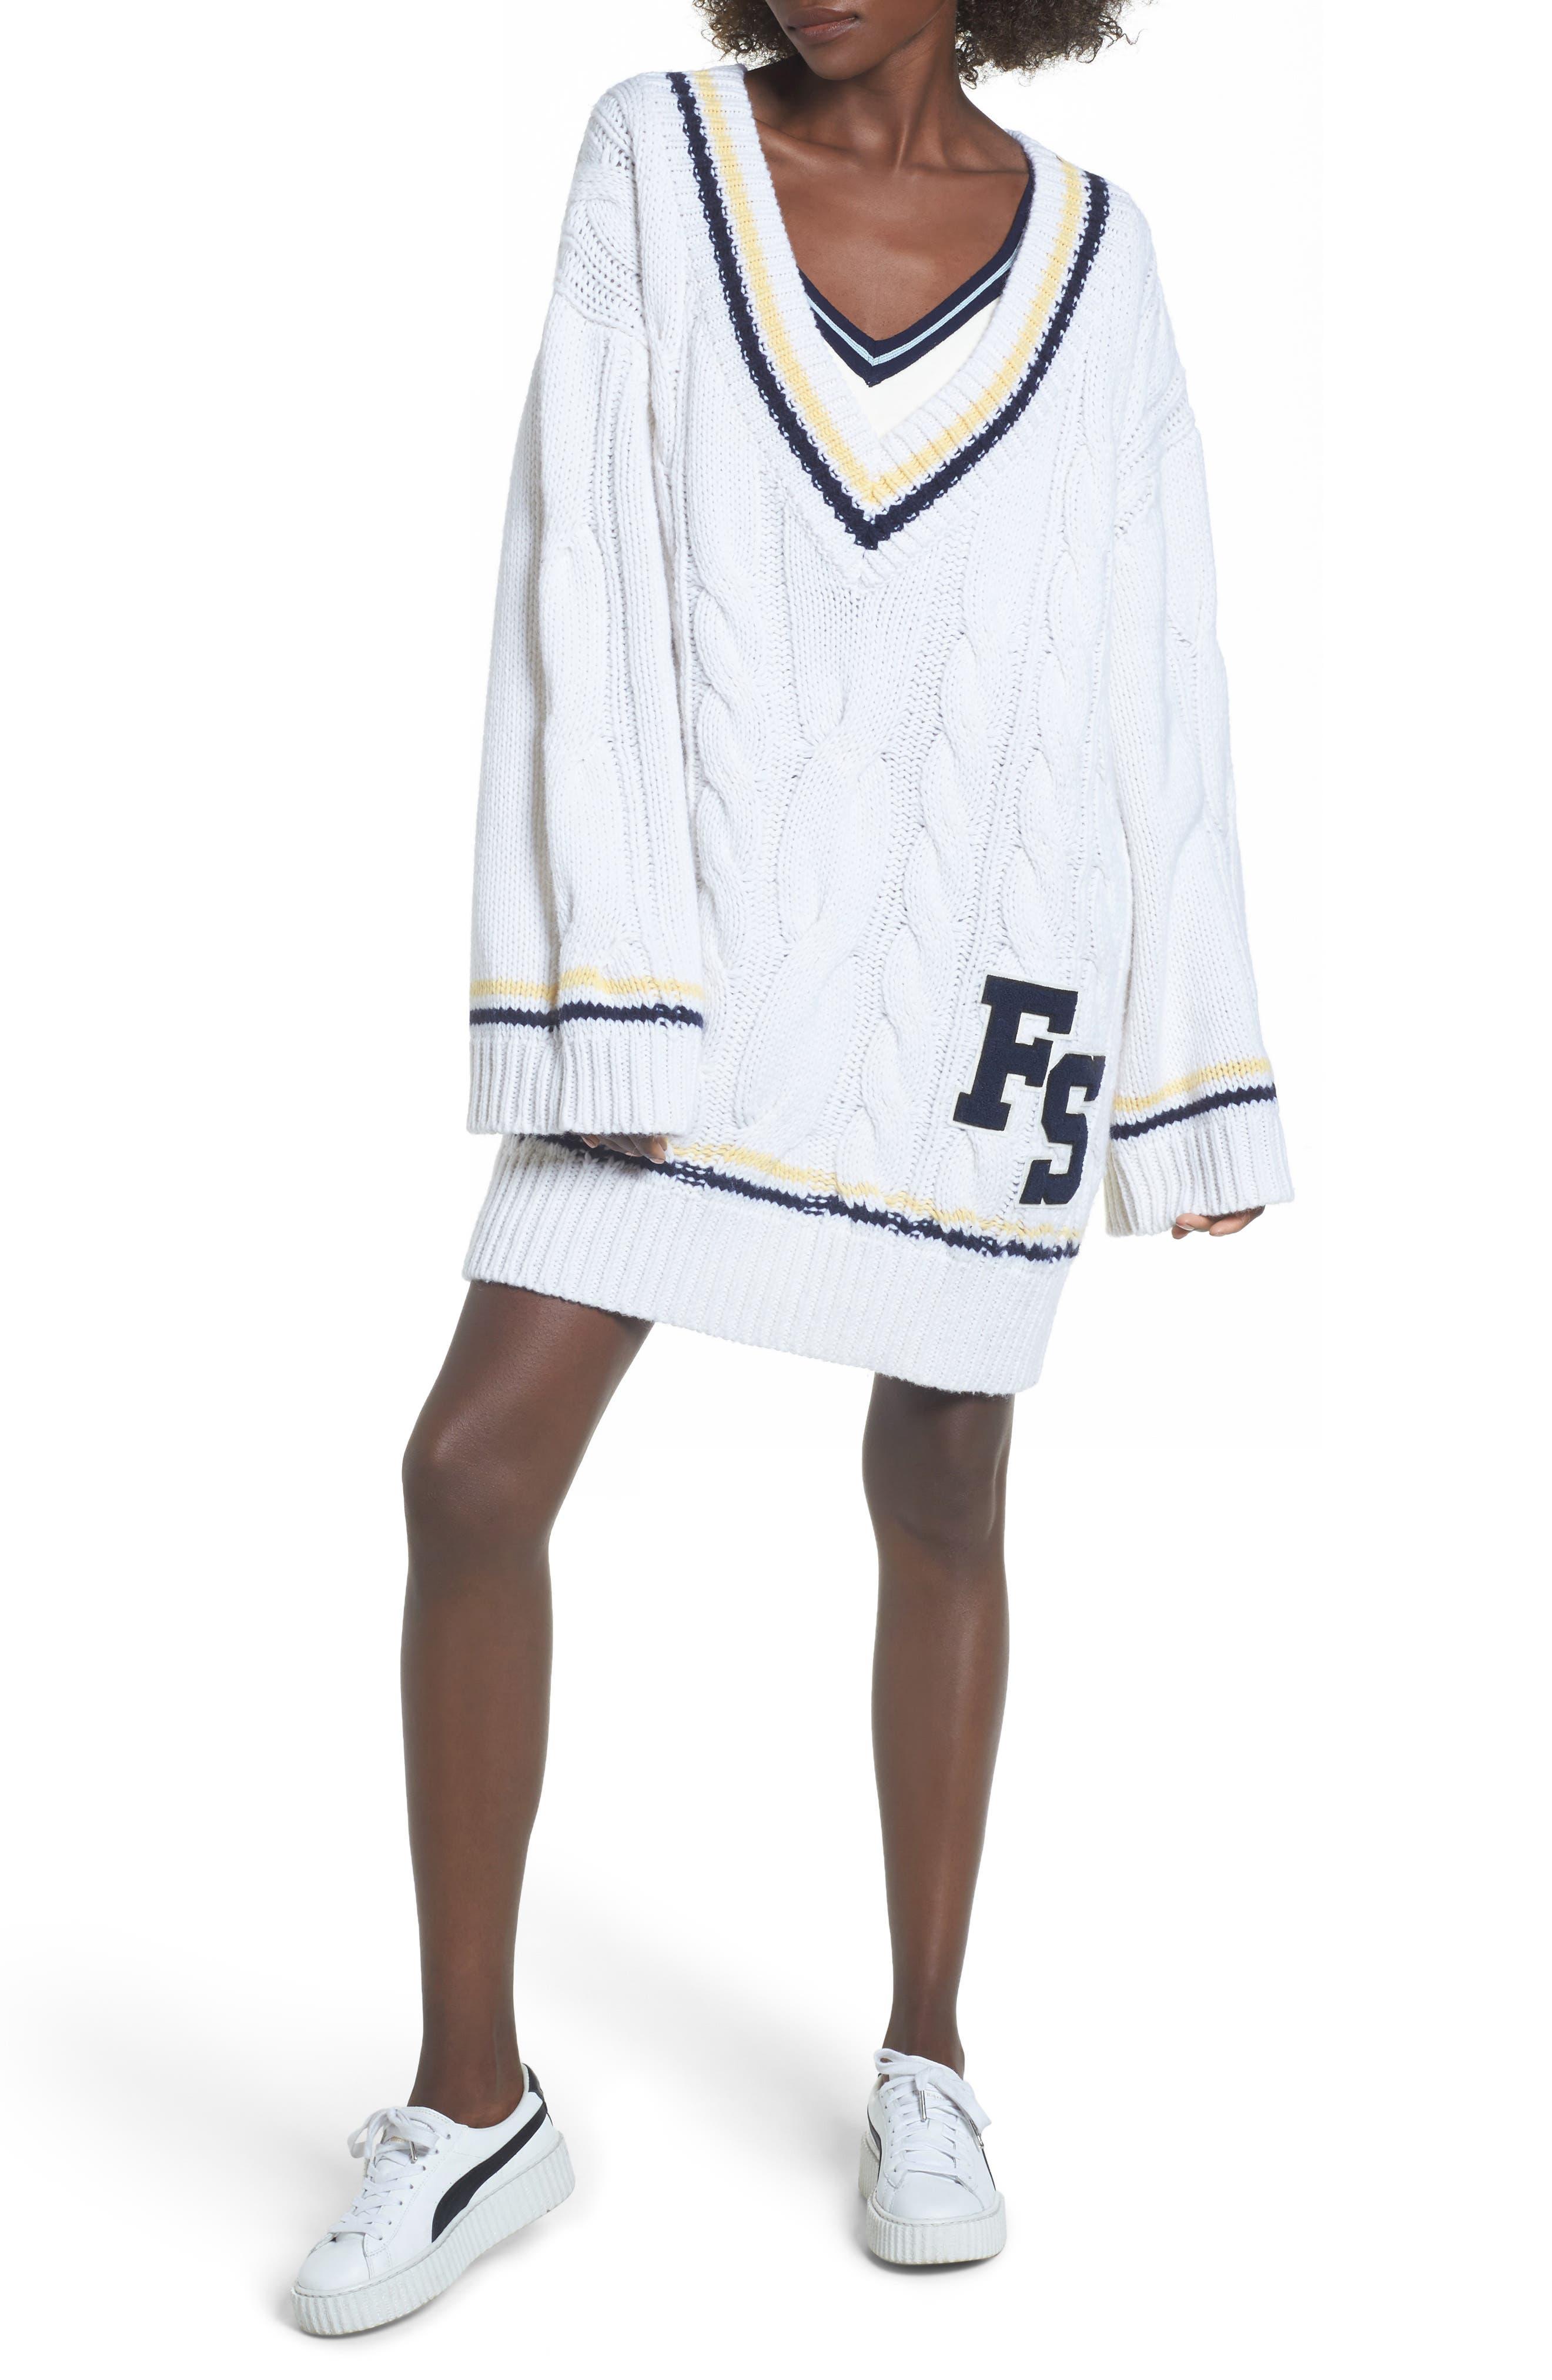 PUMA by Rihanna Longline Cable Knit Sweater,                         Main,                         color, 100